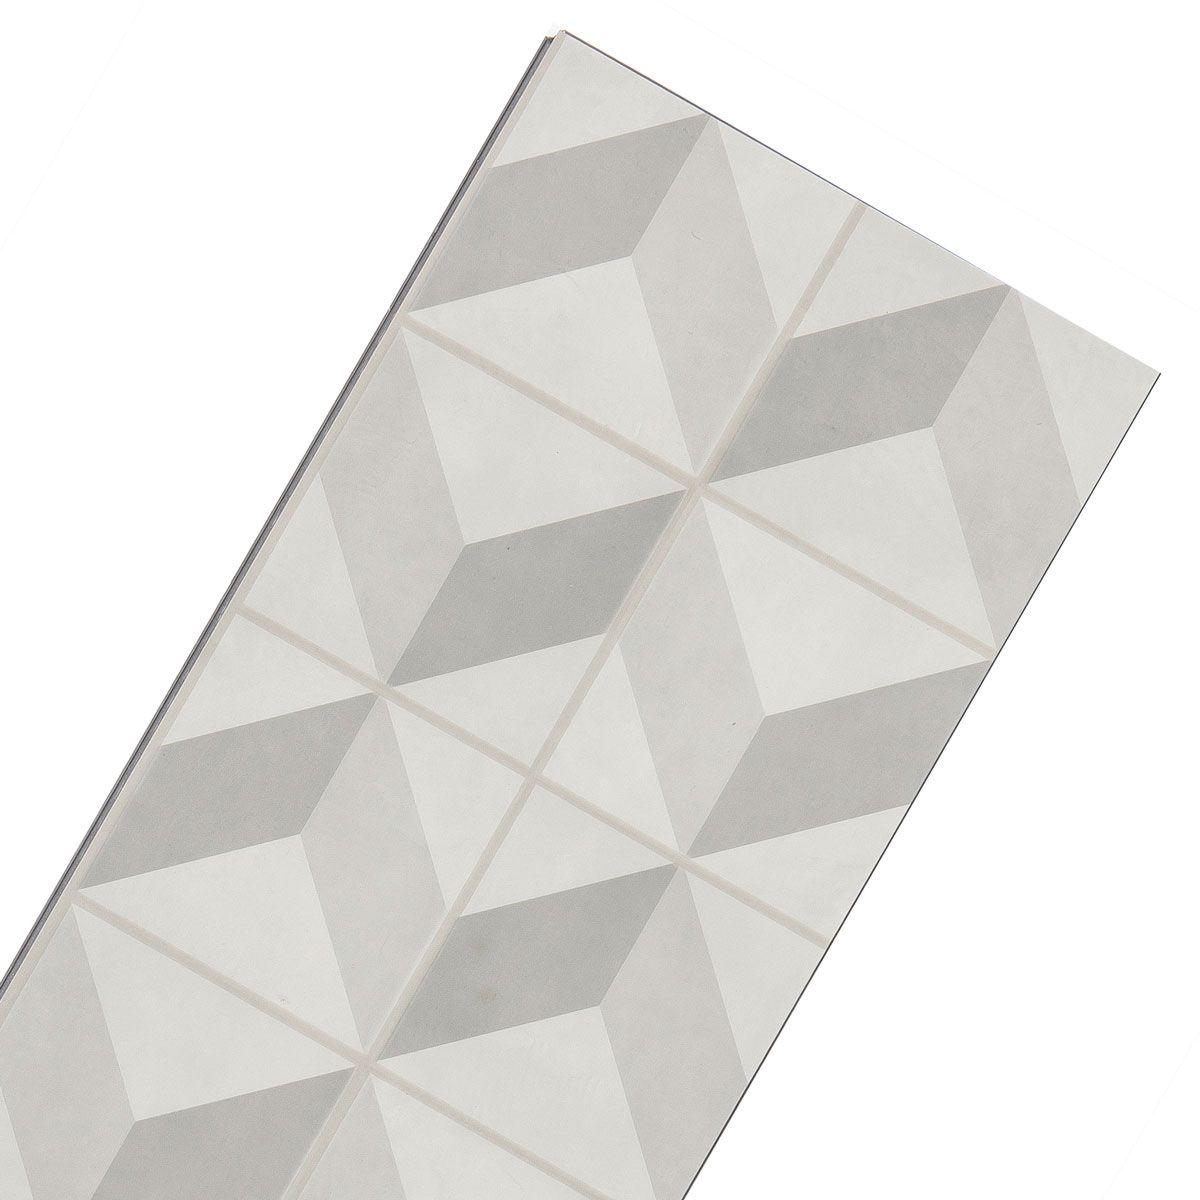 Dalle pvc clipsable cube 3D 4mm Moderno